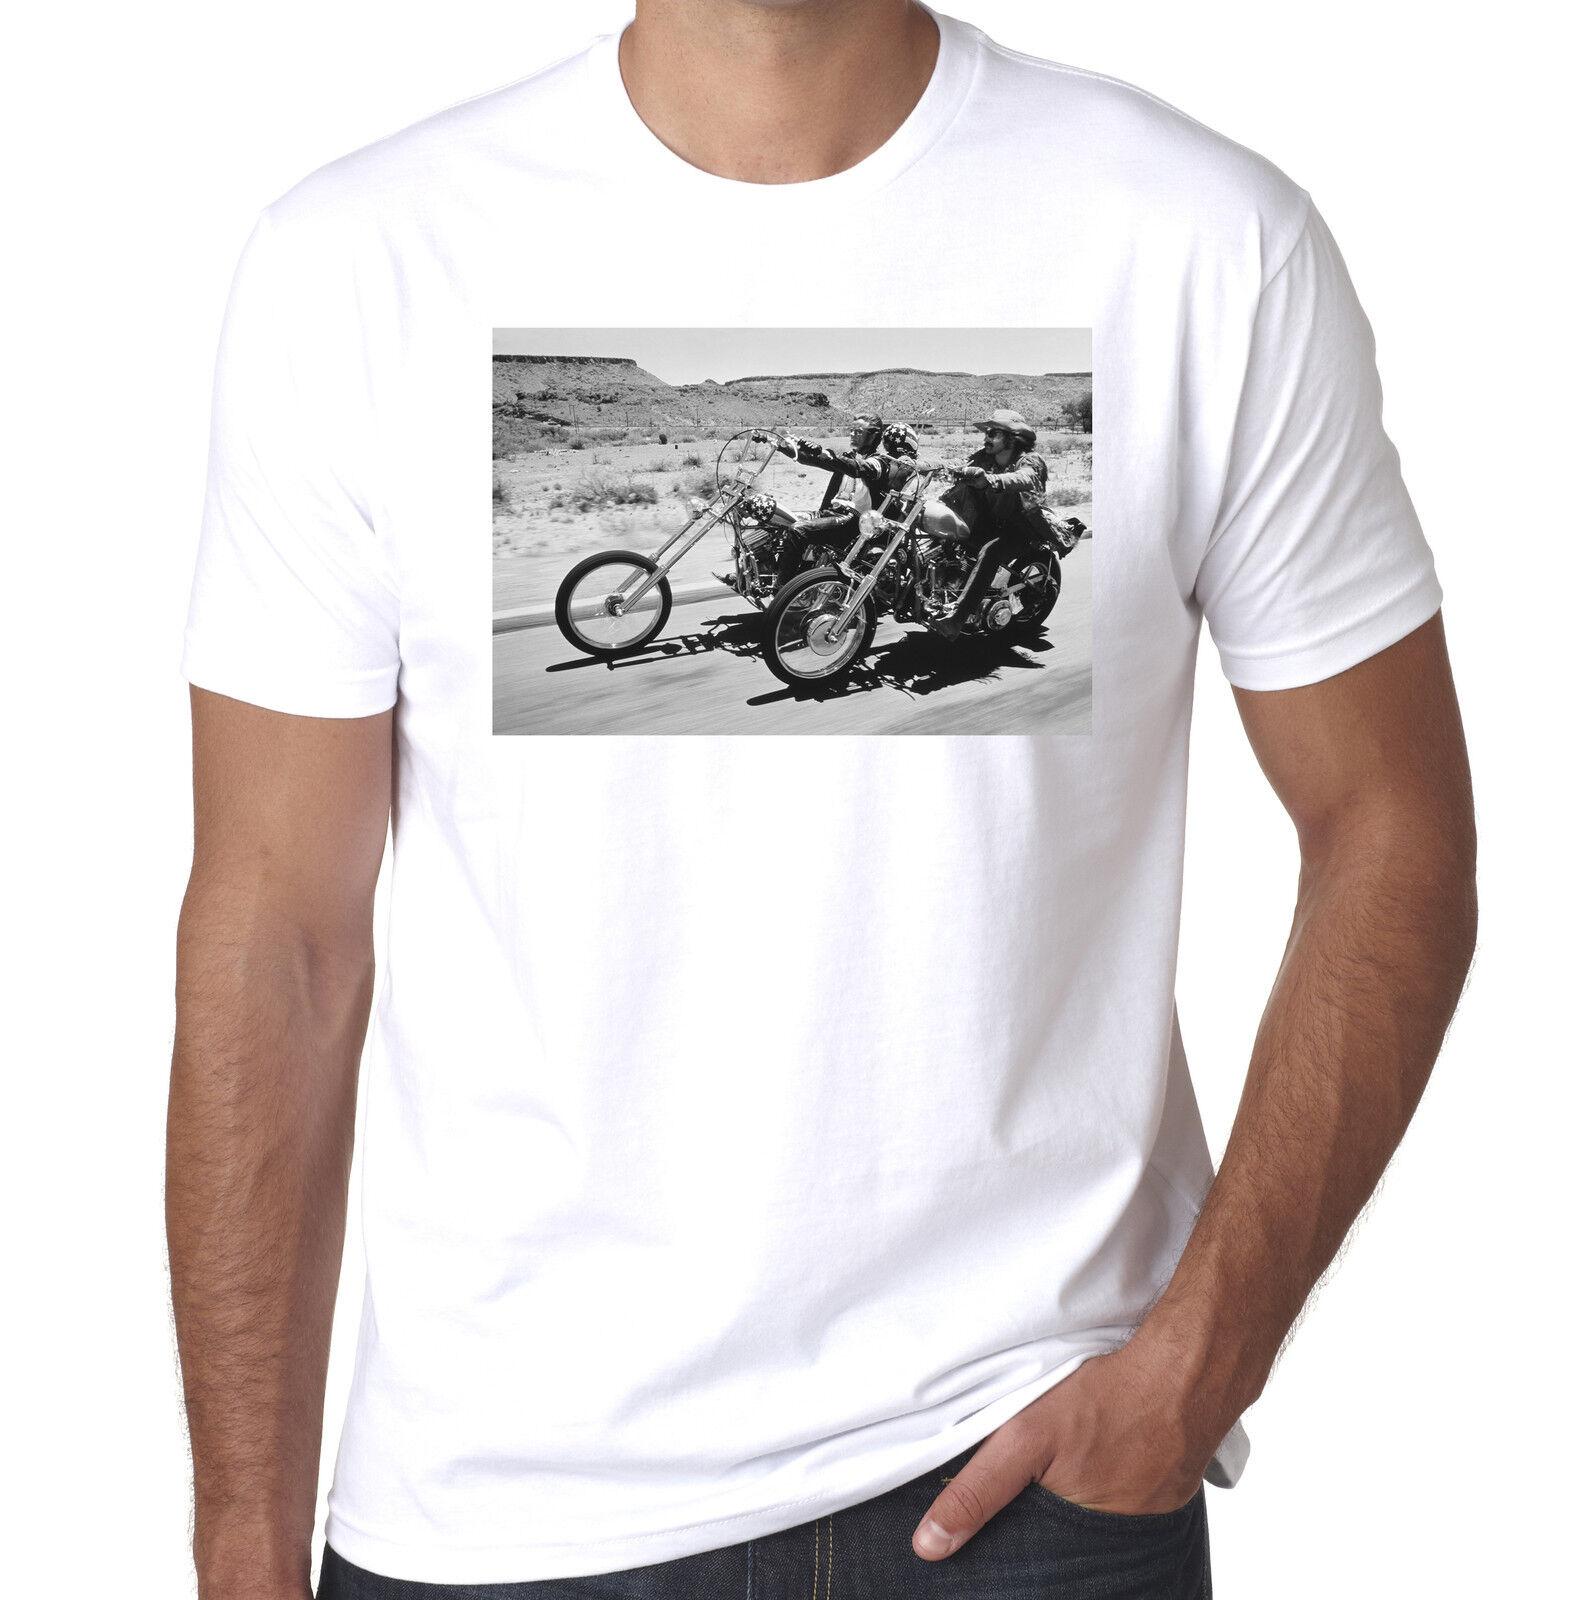 Easy Rider Peter harleys Fonda Dennis Hopper harleys Peter culte années 60 pour homme 100% coton NEUF 39e0d4